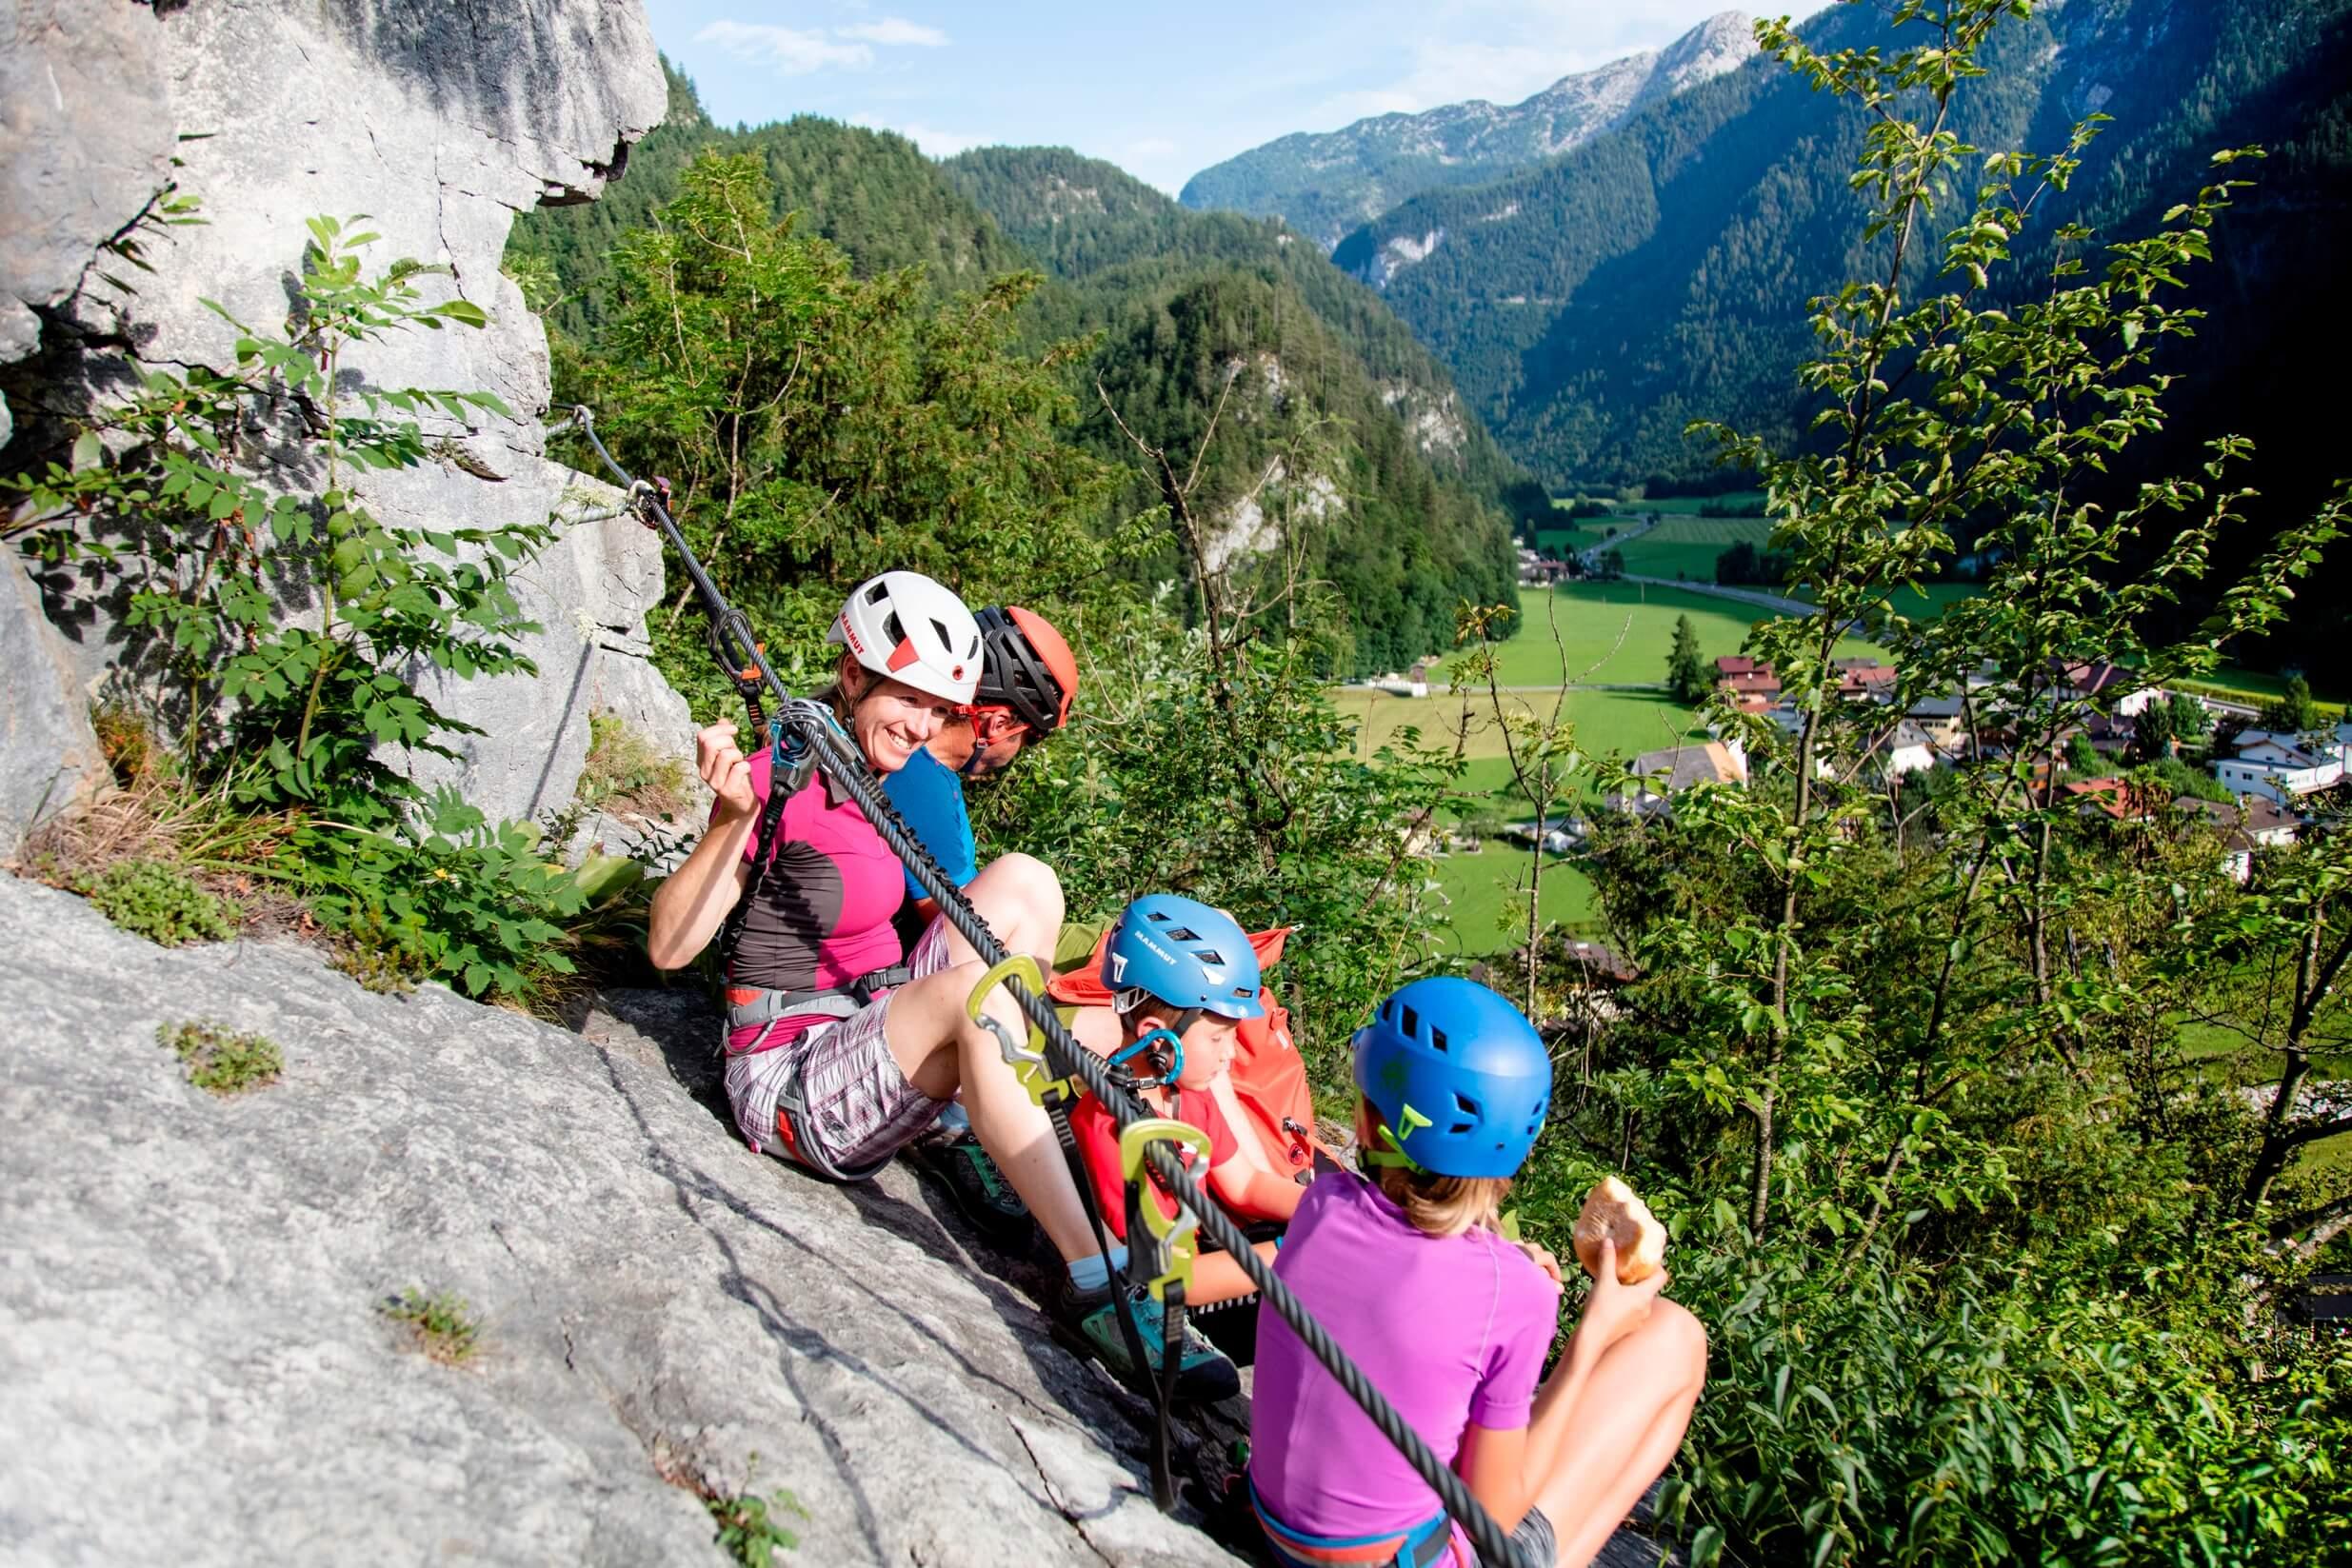 Klettersteig Zahme Gams, Salzburger Saalachtal